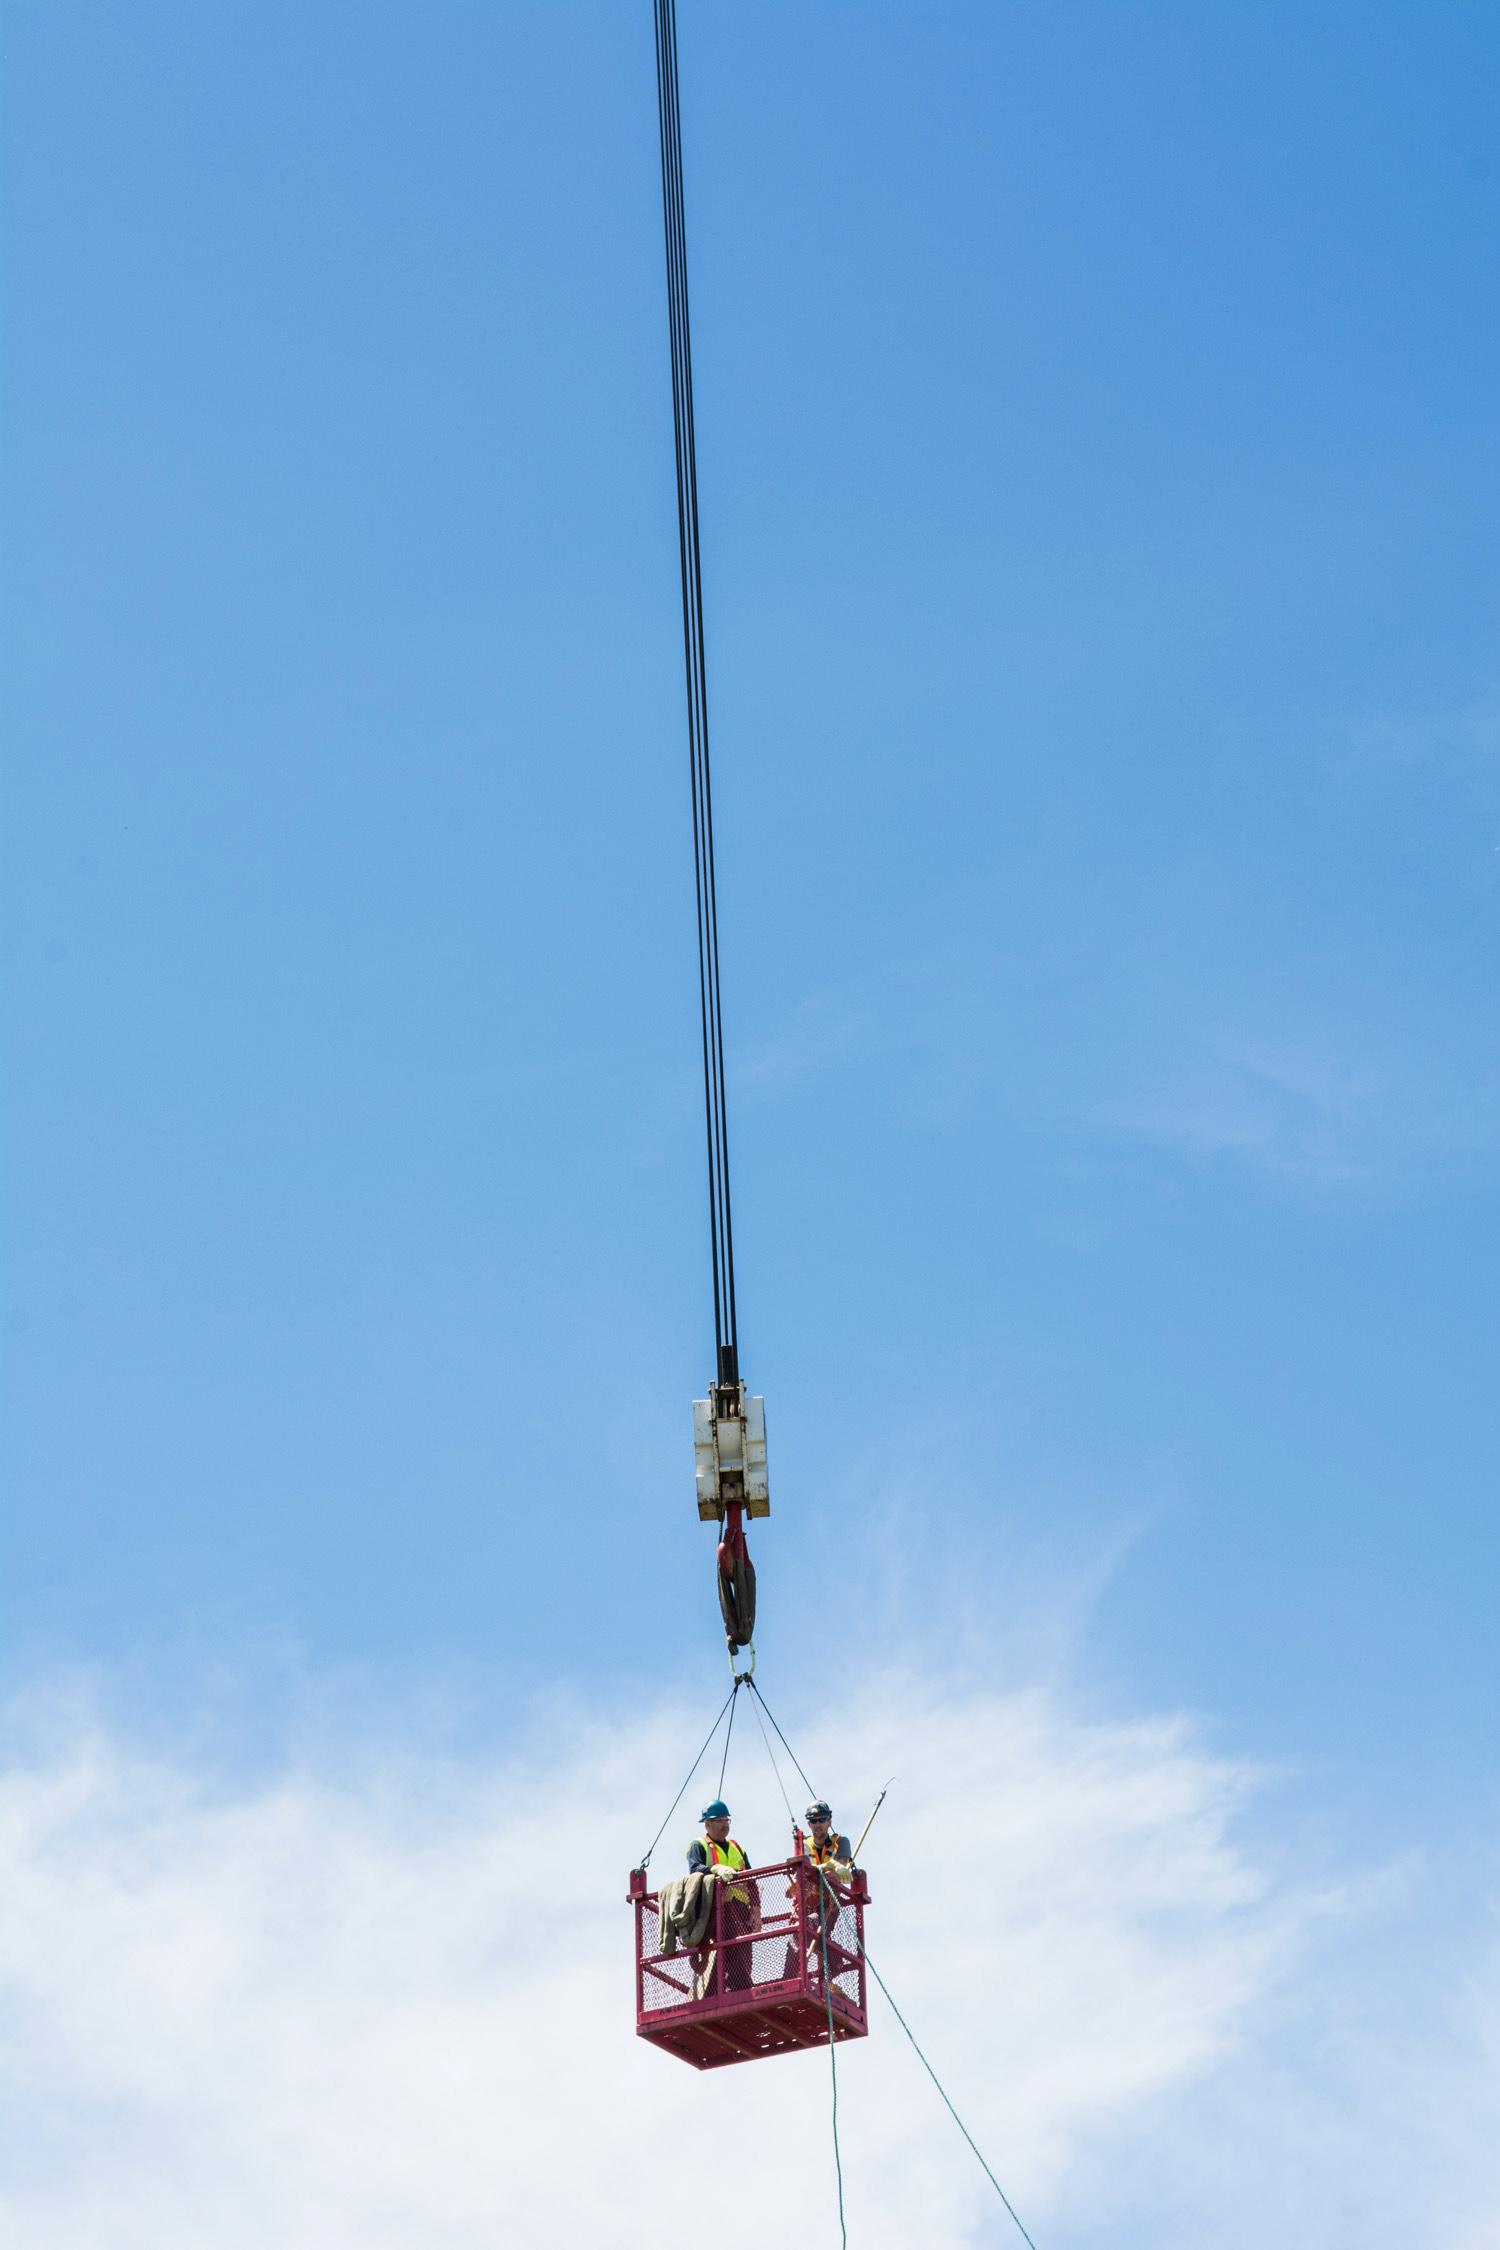 june09 2014-A. W. Leil Cranes and Equipment Limited-promo-Antigonish NS-photo by Aaron McKenzie Fraser-www.amfraser.com-7095.jpg